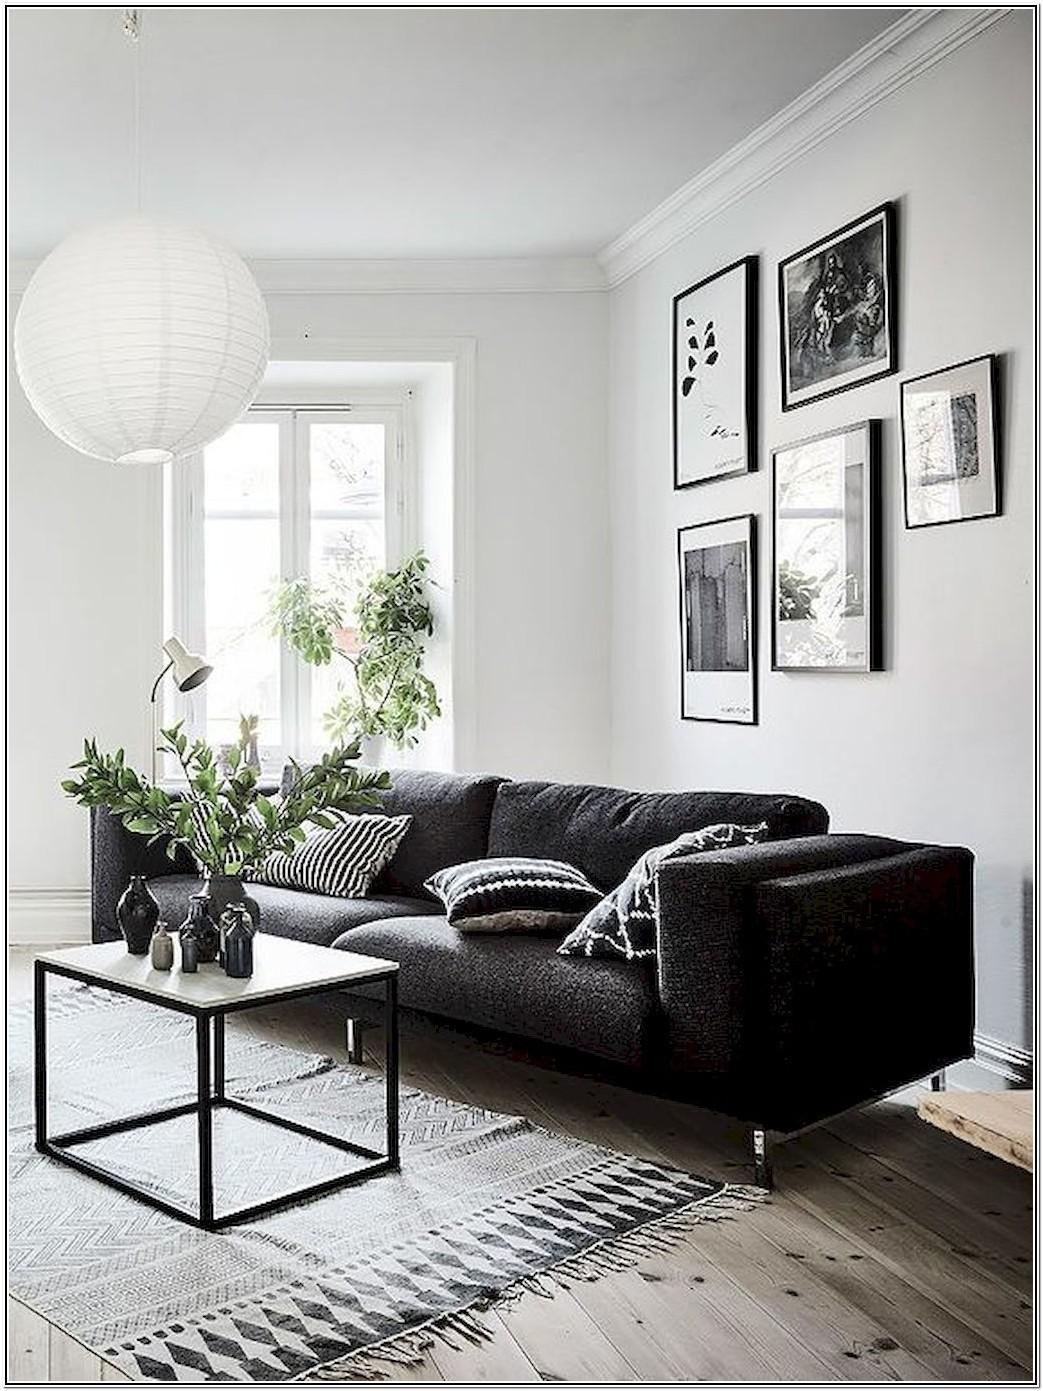 Living Room Black Sofa Interior Design Ideas